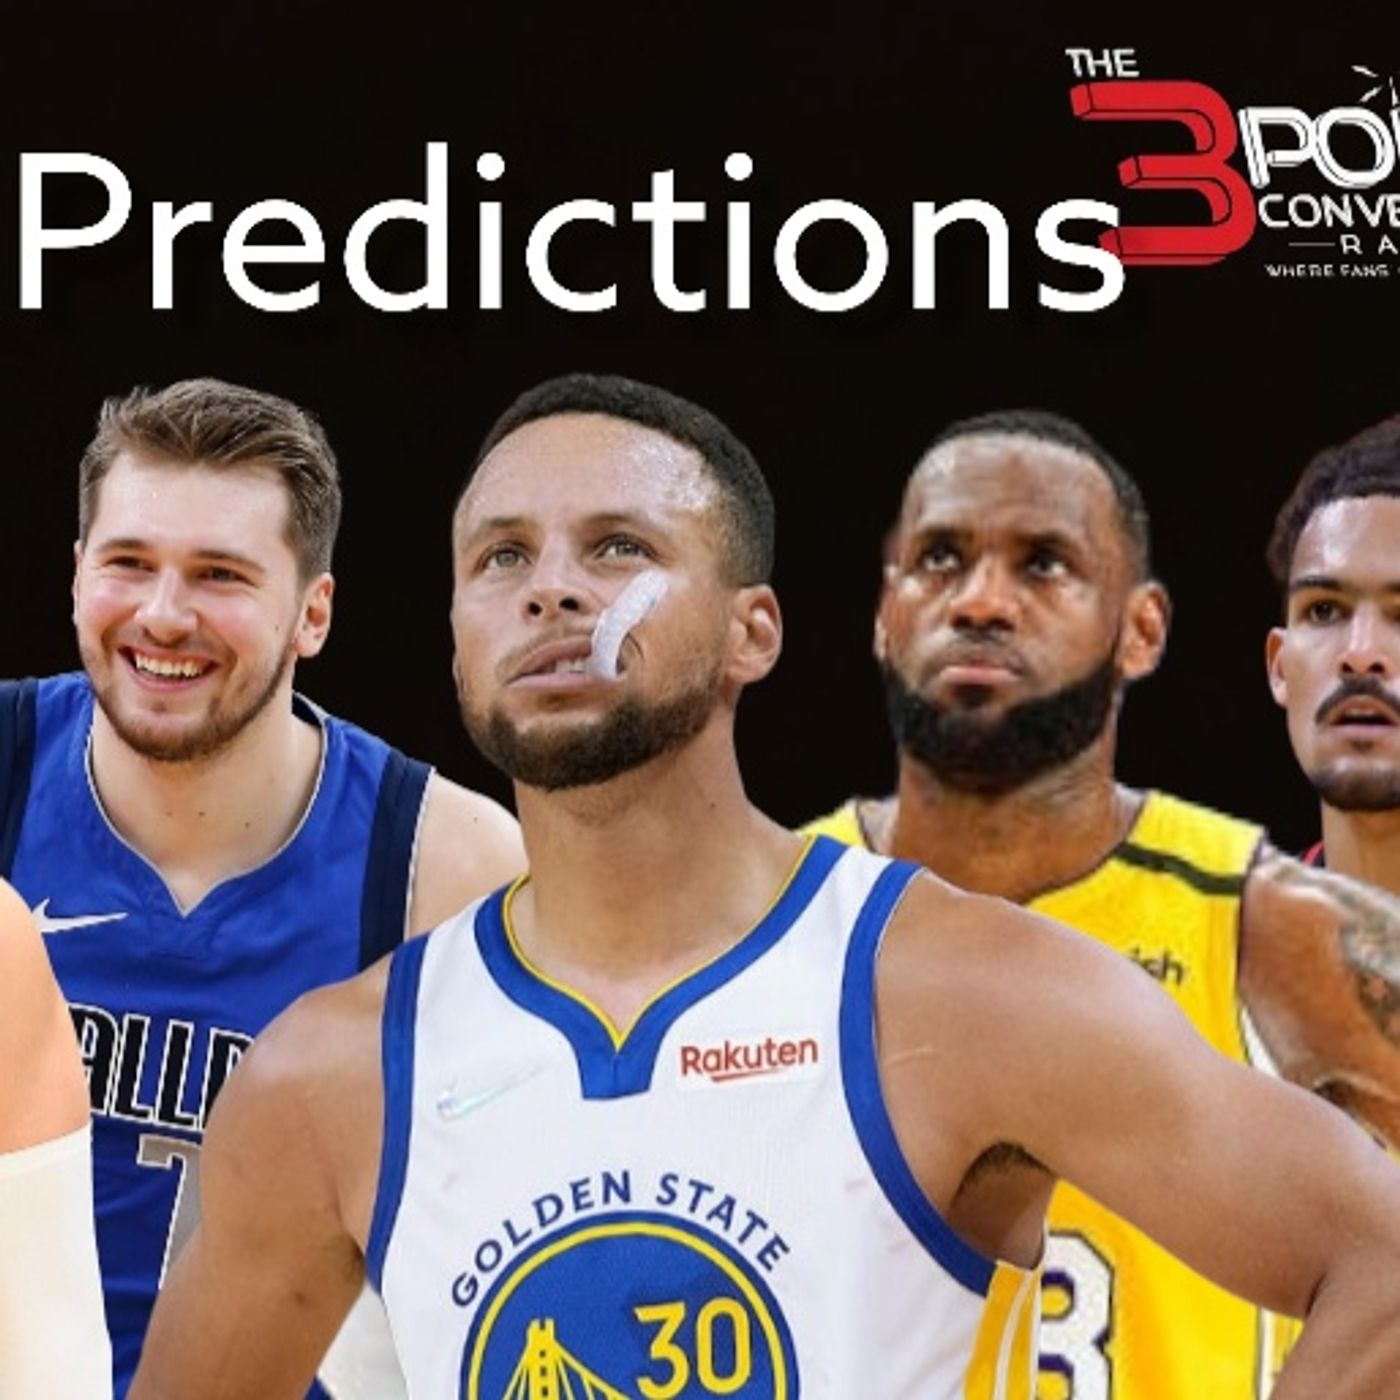 The 3 Point Conversion Sports Lounge - Kyrie vs. Nets, Questionable CFB Polls, NBA Predictions, Lamar vs. Justin, MLB Postseason